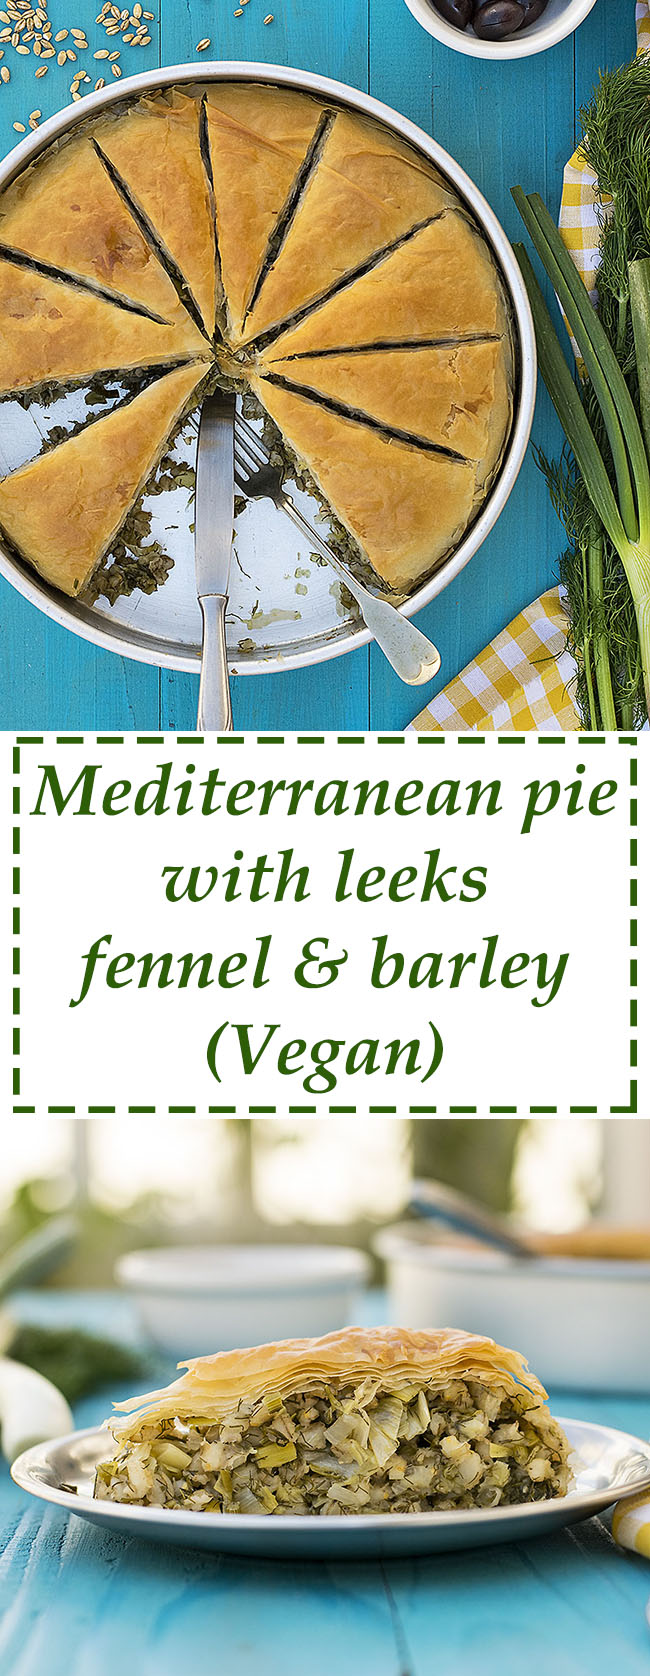 Mediterranean leek, fennel and barley pie (Vegan) 6